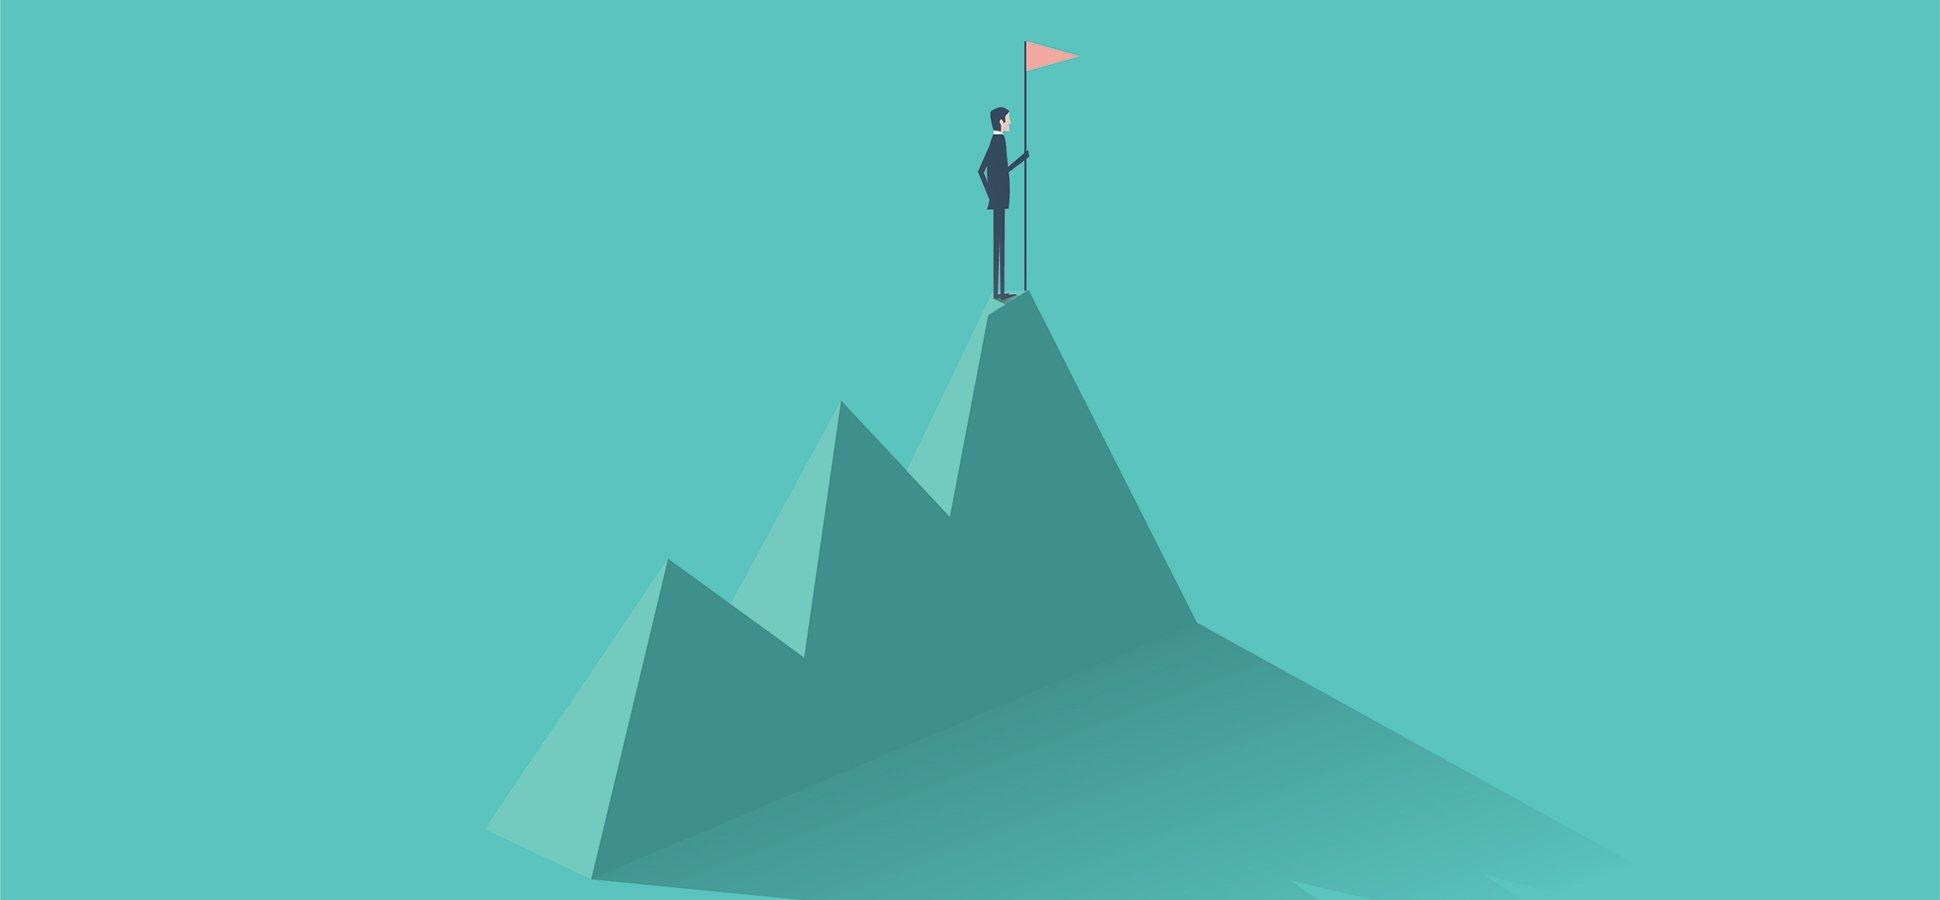 how to write a great business plan the executive summary inccom